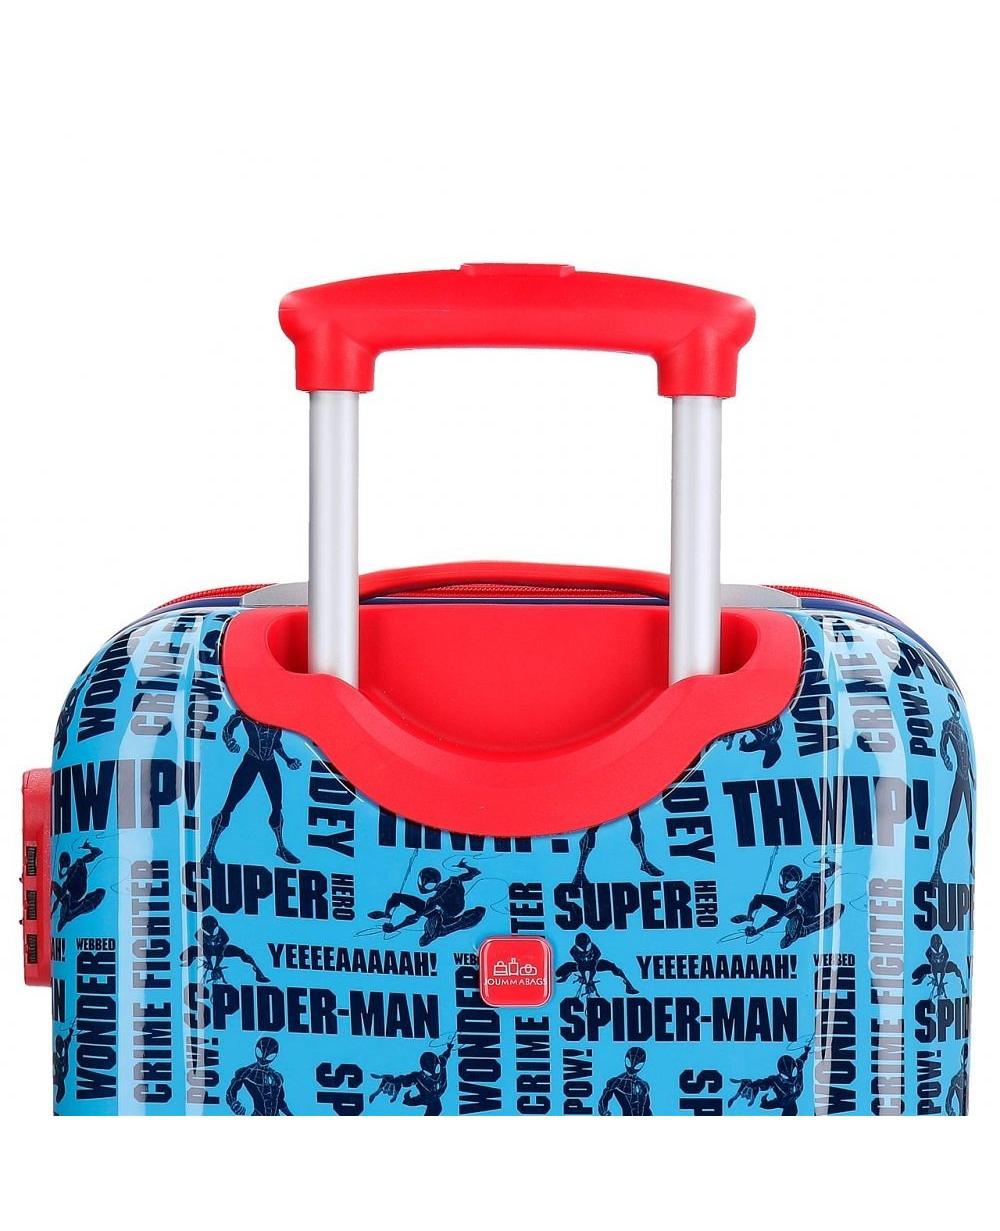 6da1f2940 Maleta de mano Marvel Spiderman Street Azul - 55cm | Maletia.com